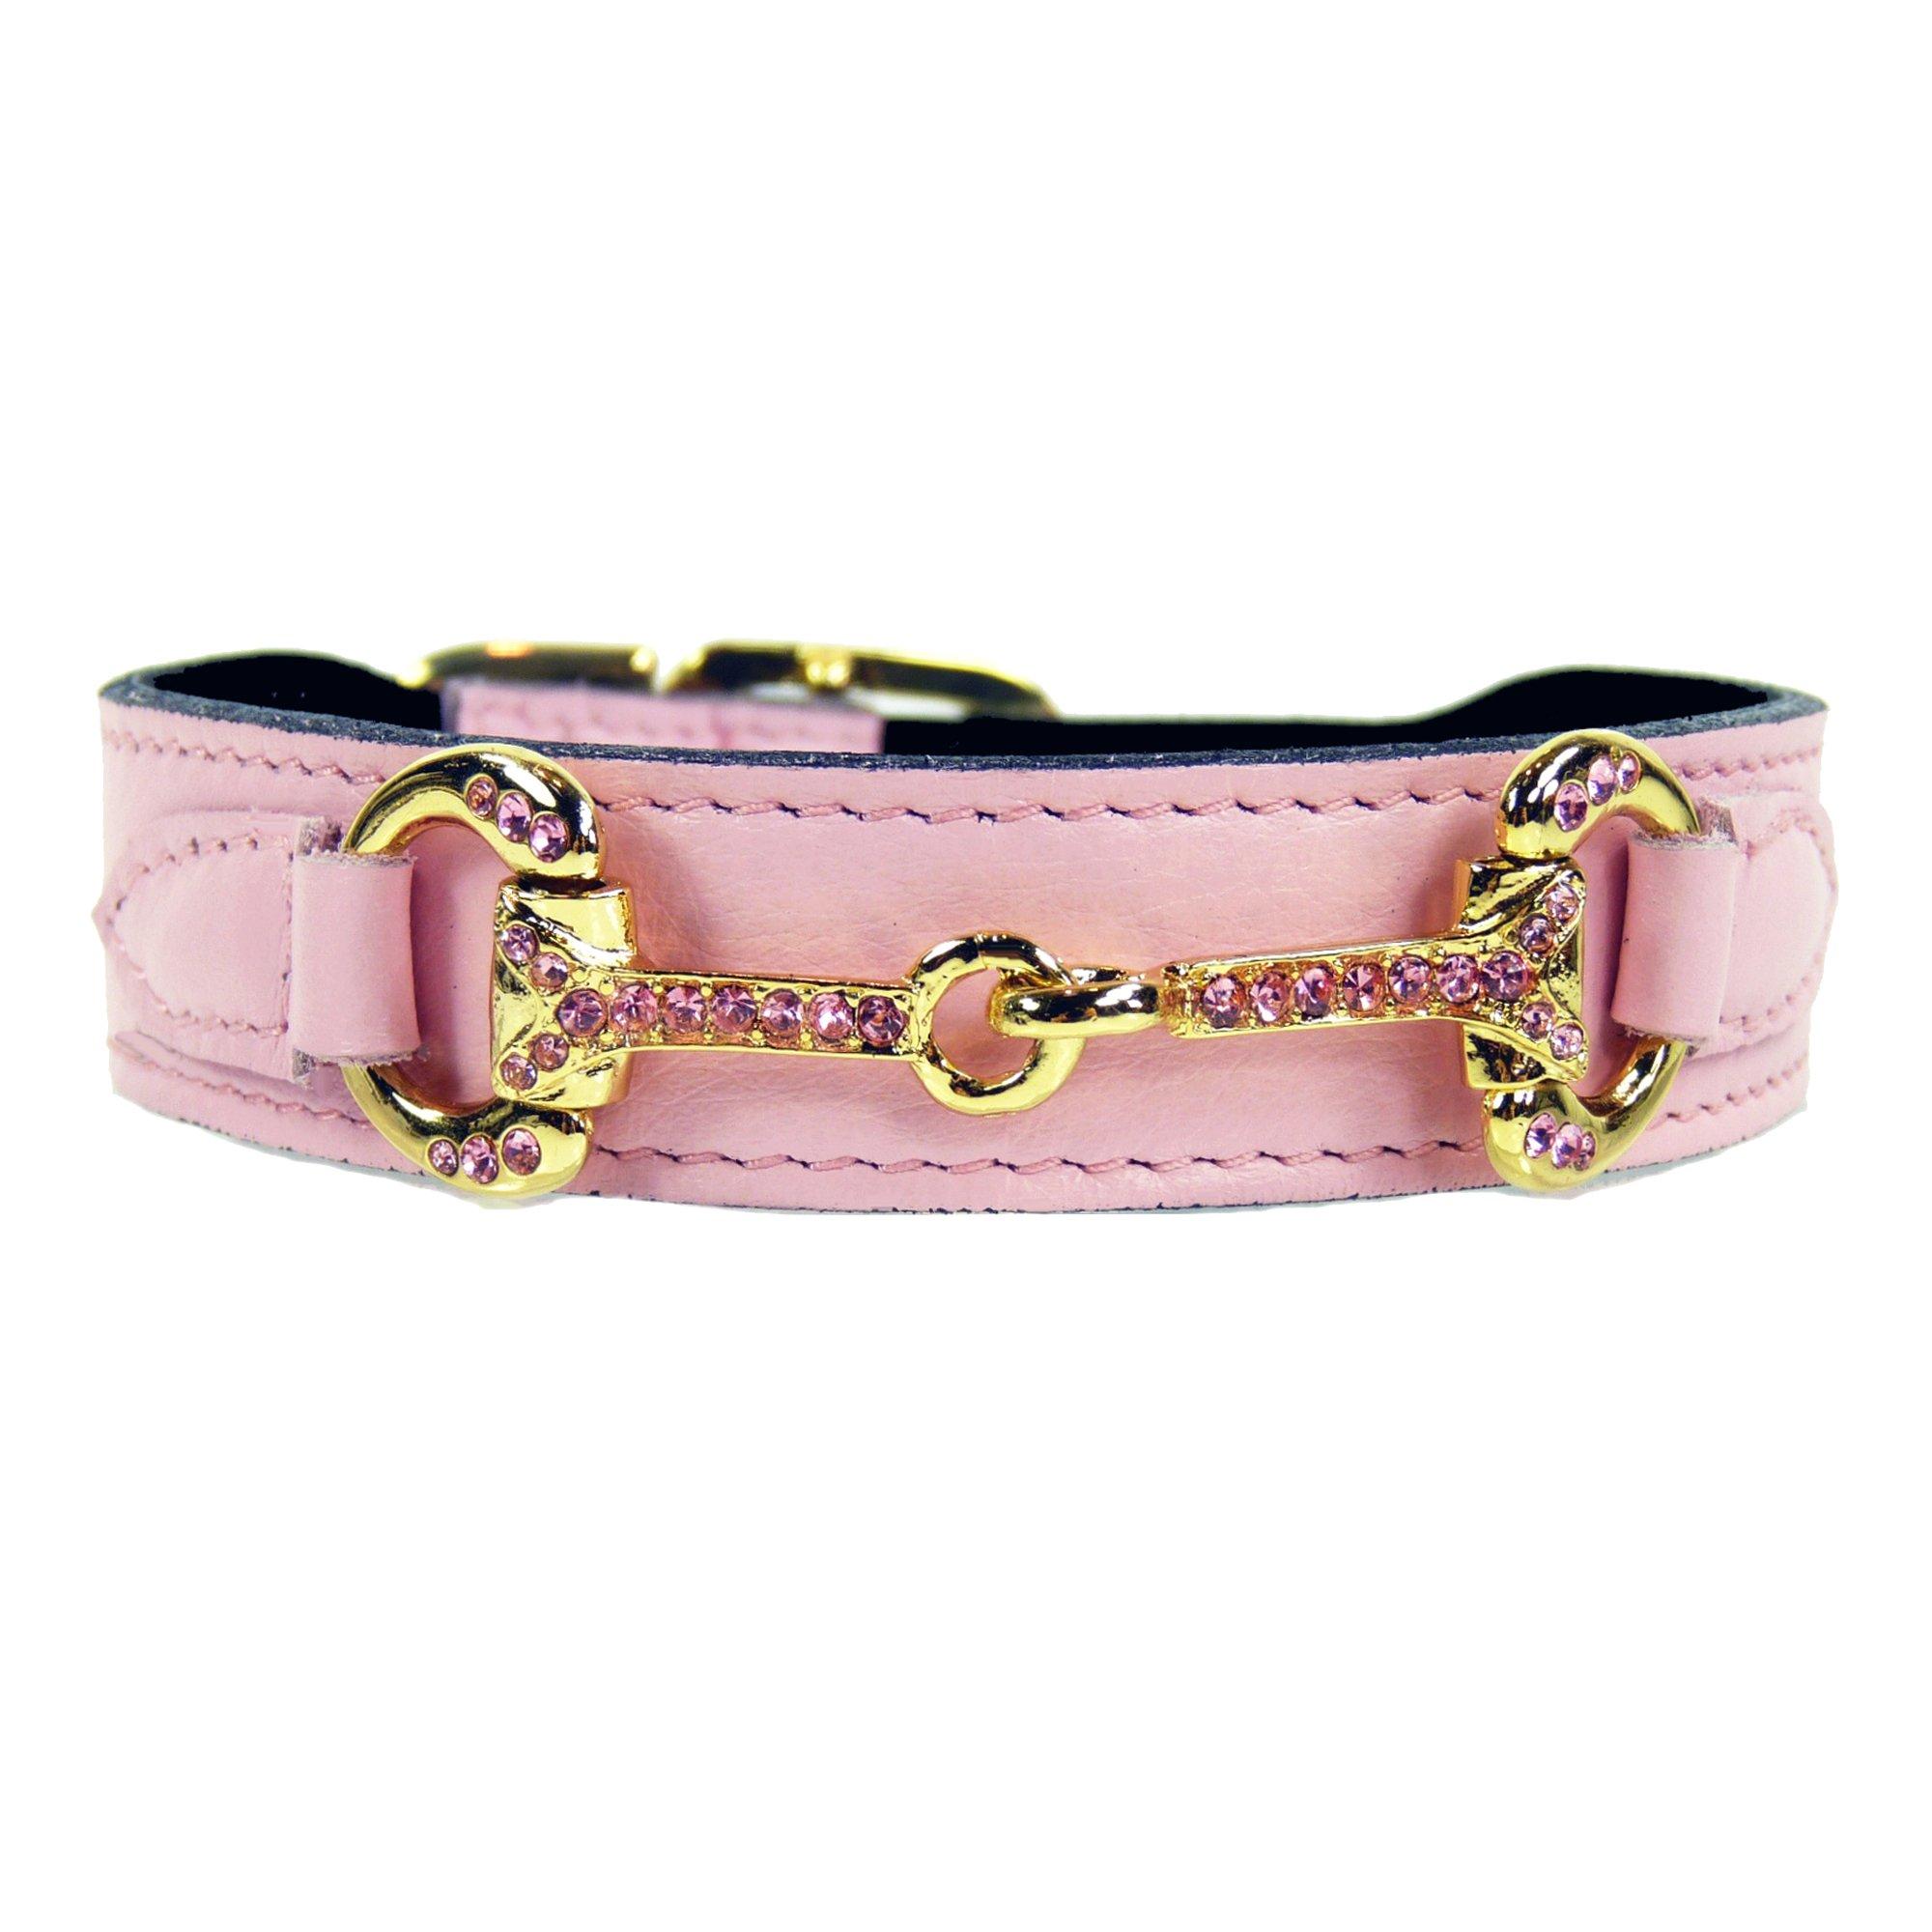 Hartman & Rose Horse and Hound Collar, Sweet Pink, 14''